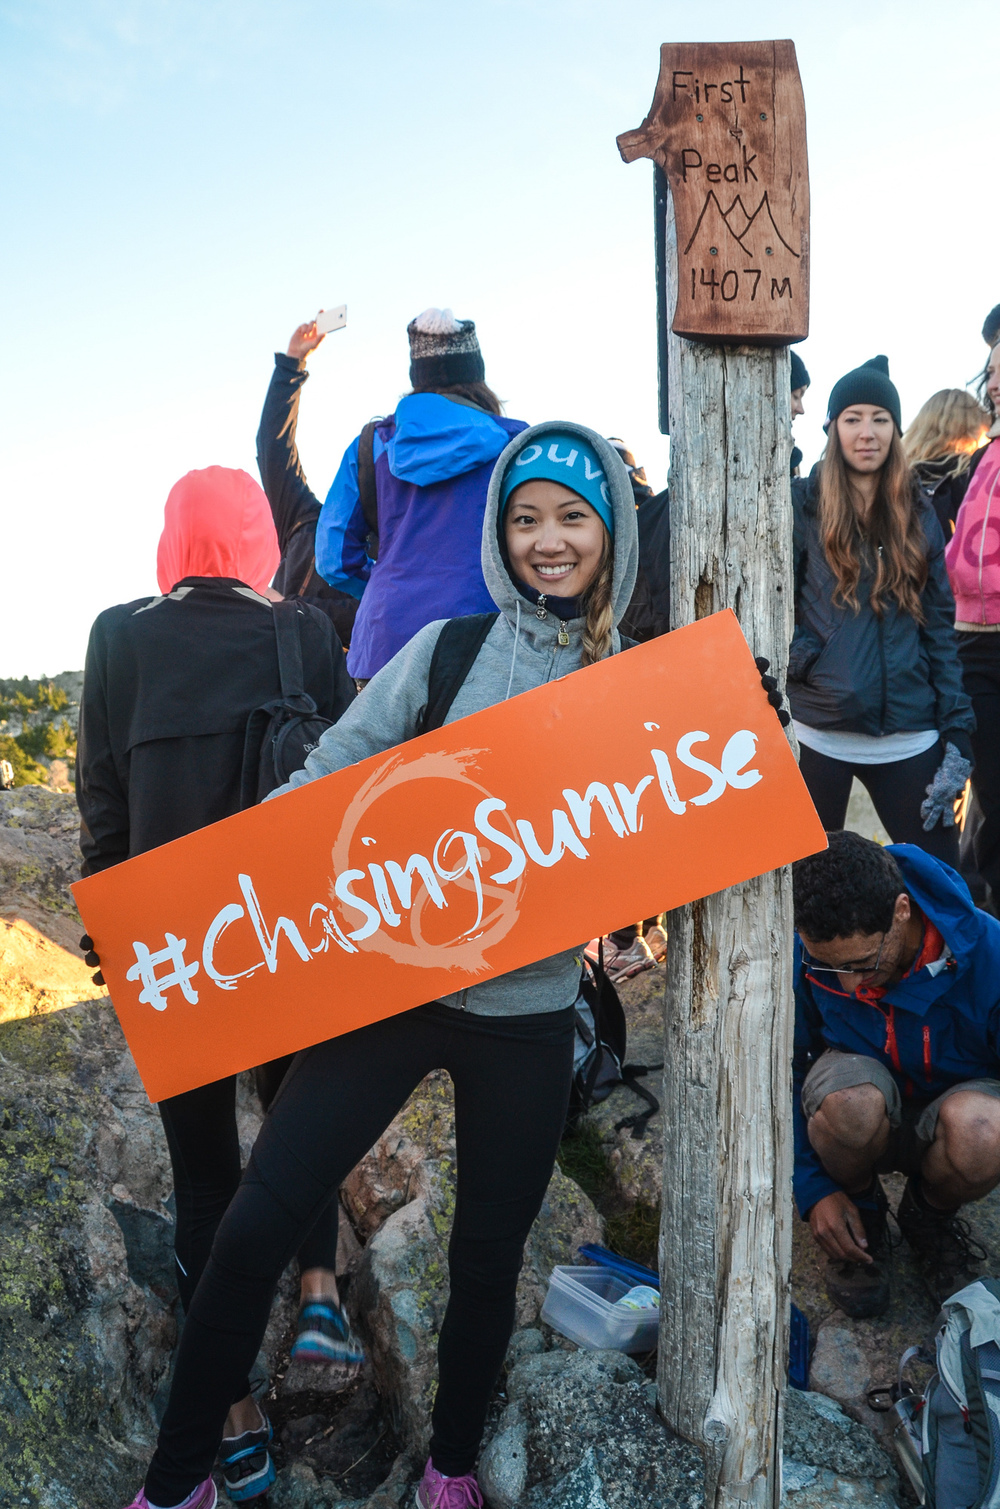 20150621 - Summer Solstice Chasing Sunrise-39.jpg